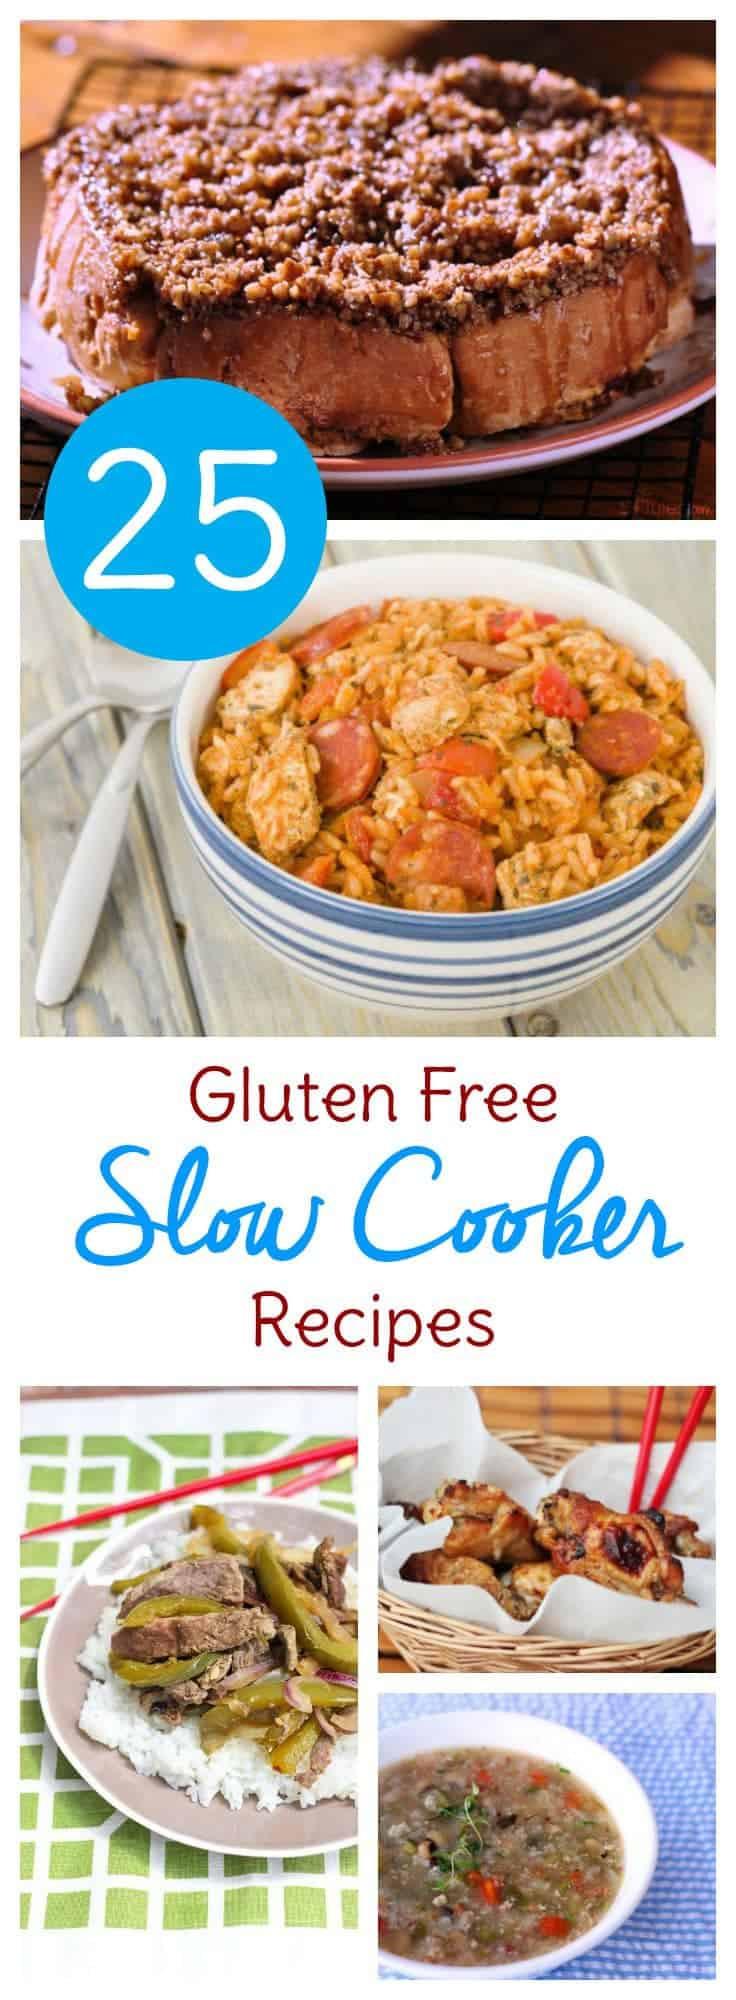 Easy Gluten Free Crockpot Recipes  25 Easy Gluten Free Crock Pot Recipes Sweet T Makes Three